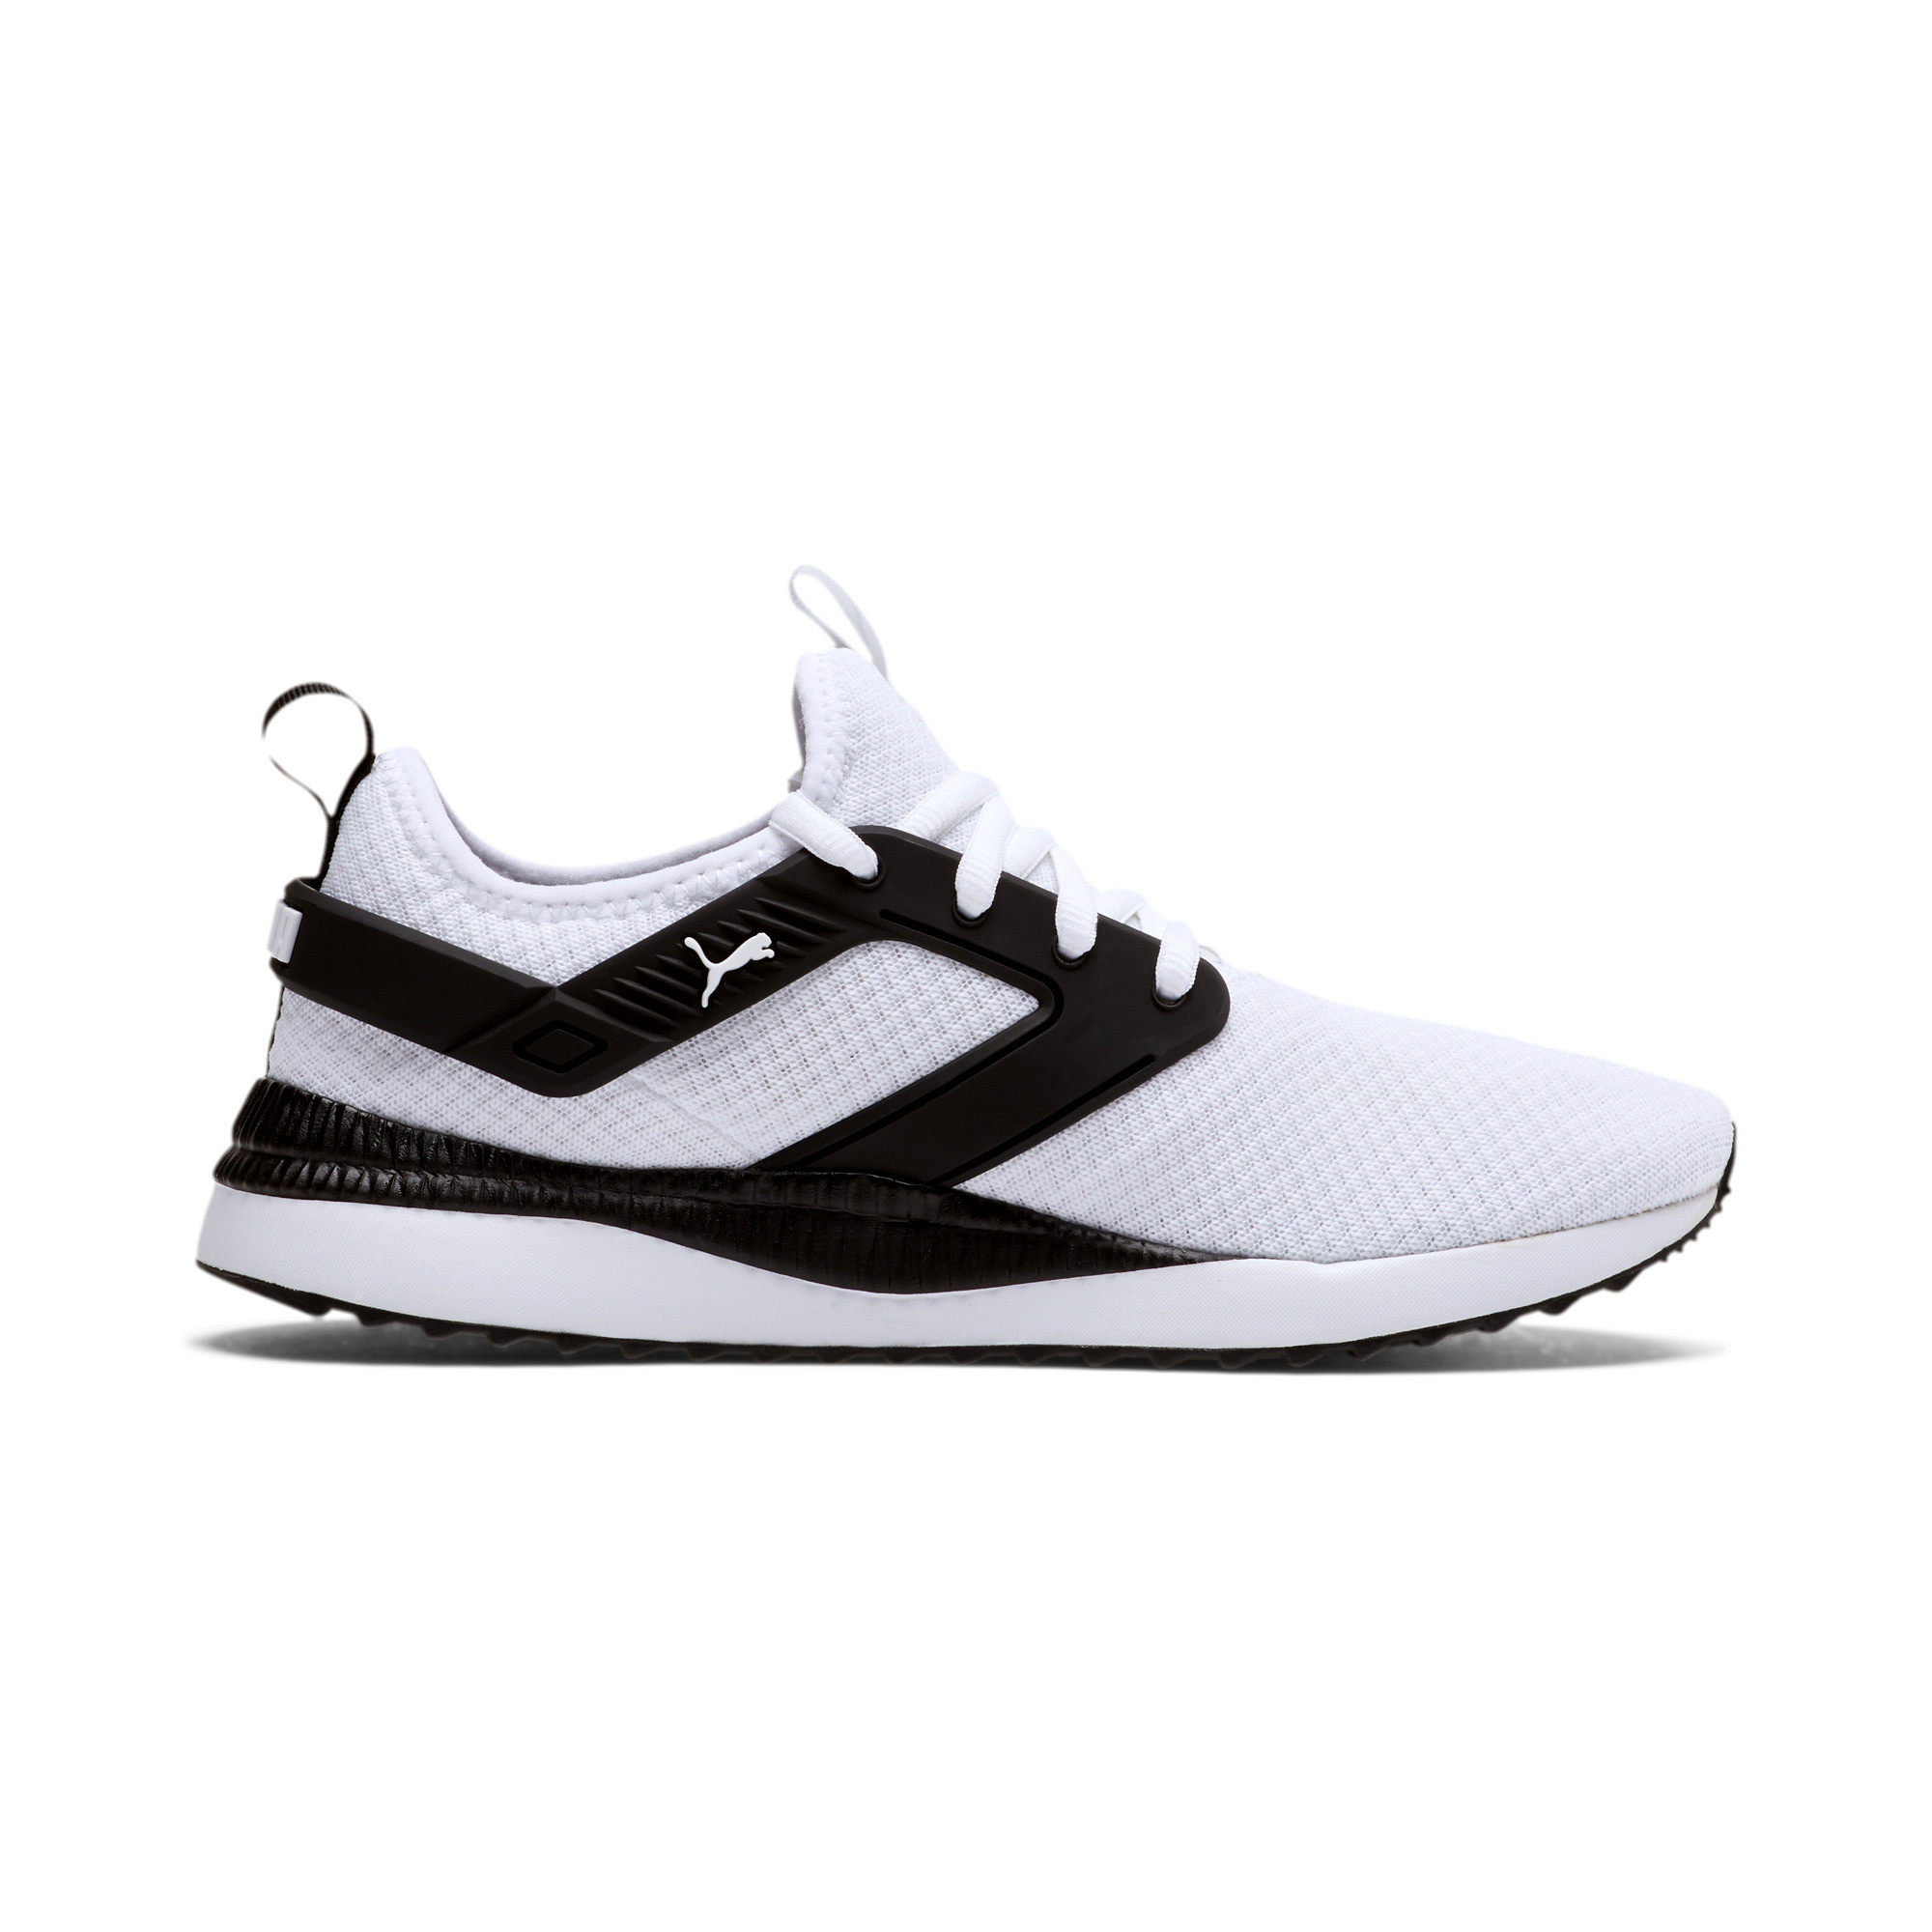 PUMA-Unisex-Pacer-Next-Excel-Mesh-Training-Shoes thumbnail 12